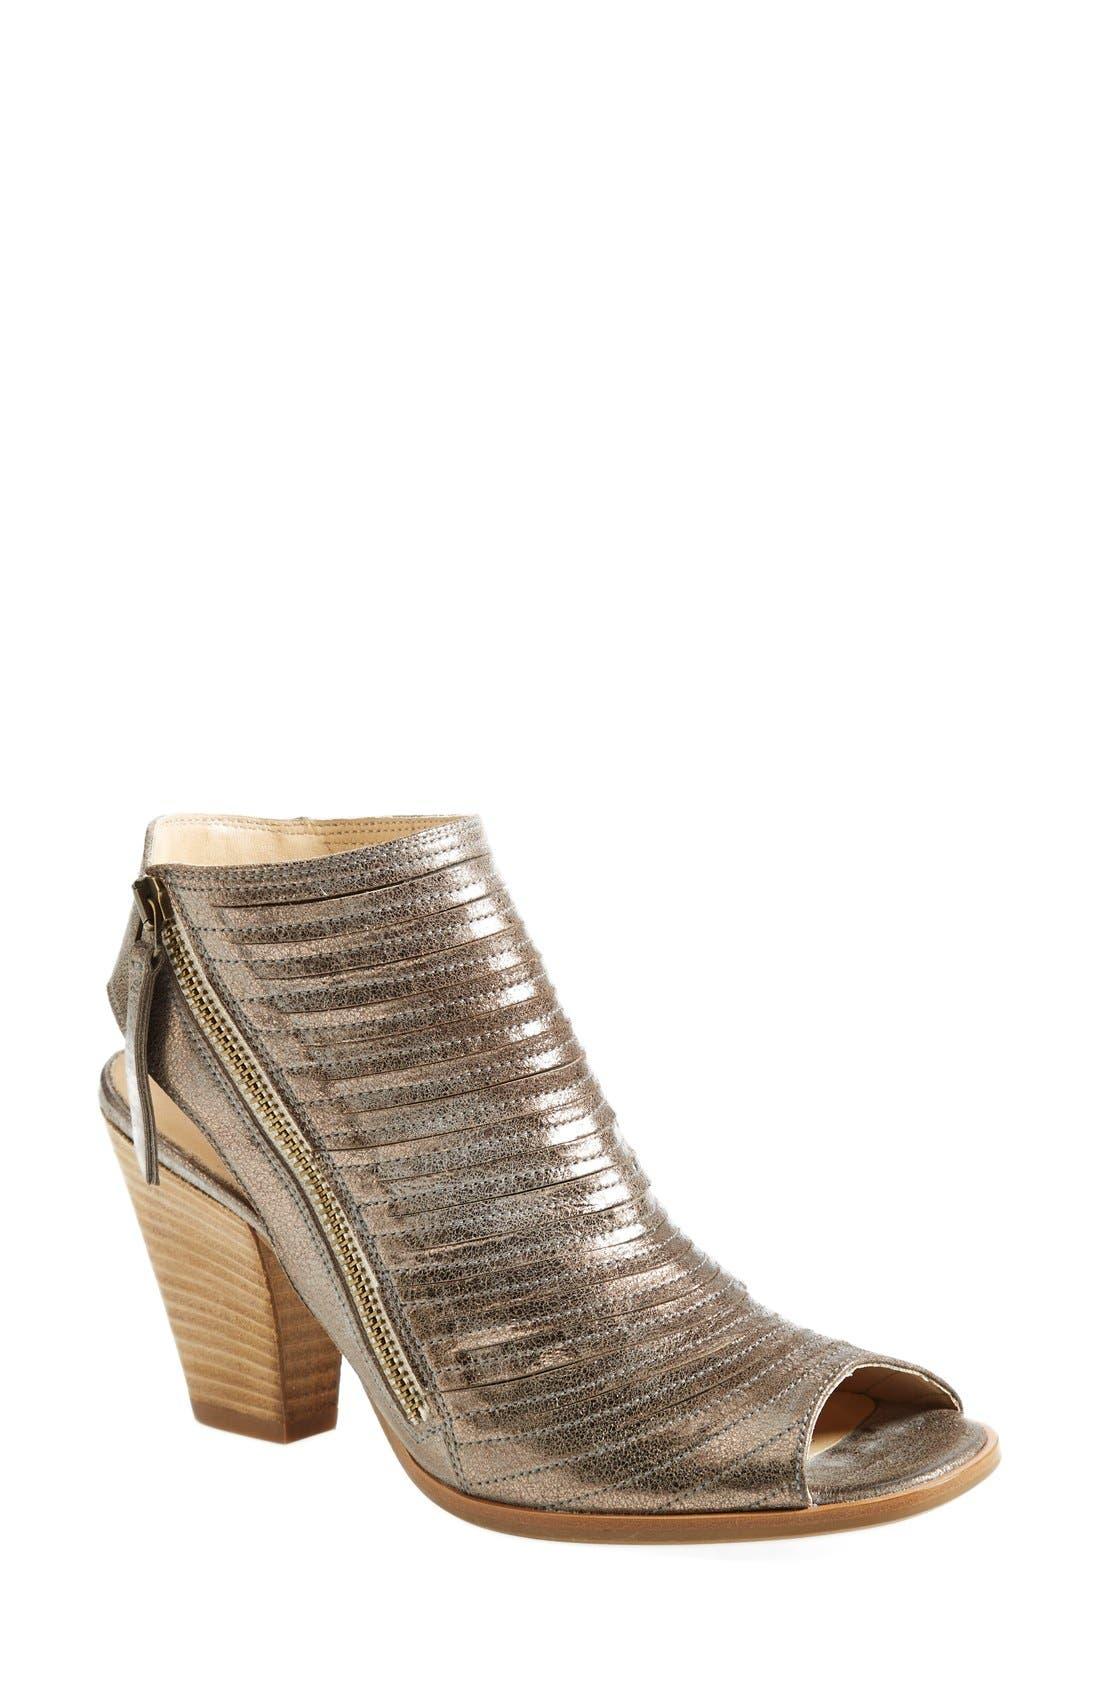 'Cayanne' Leather Peep Toe Sandal,                             Main thumbnail 8, color,